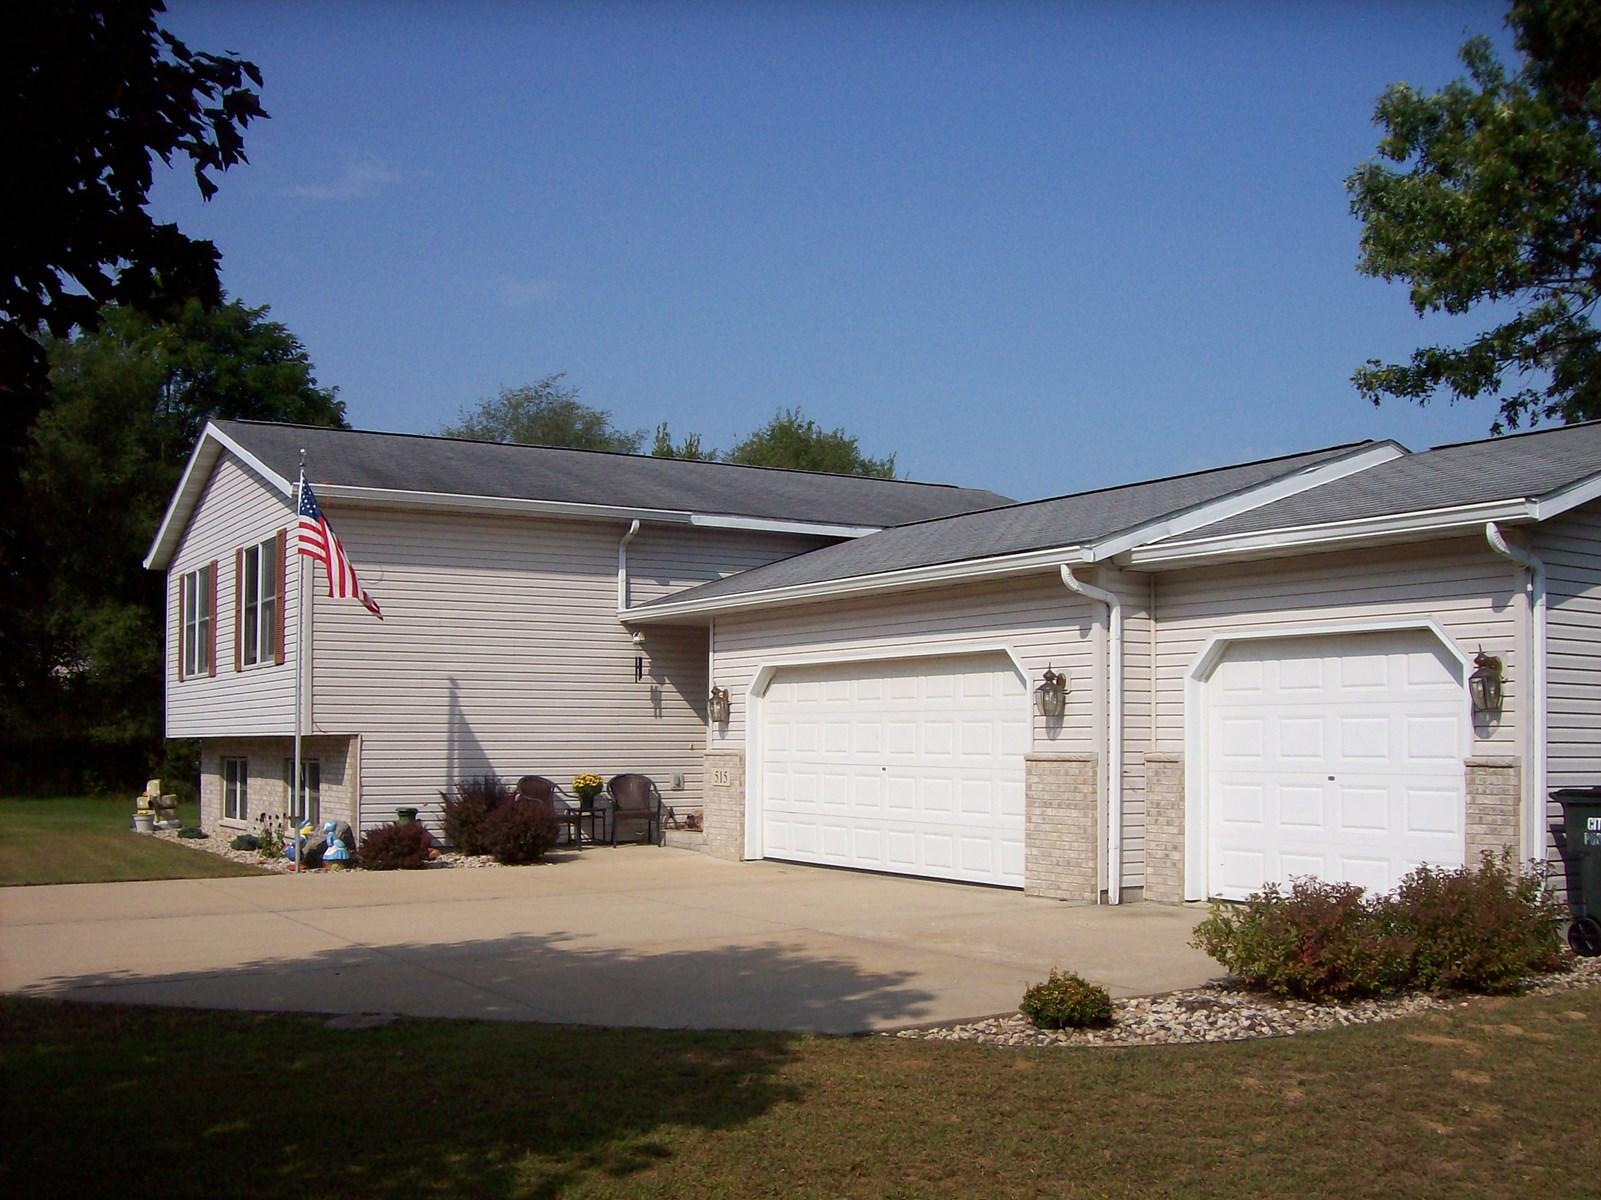 Move in Ready Home close to schools Portage, WI